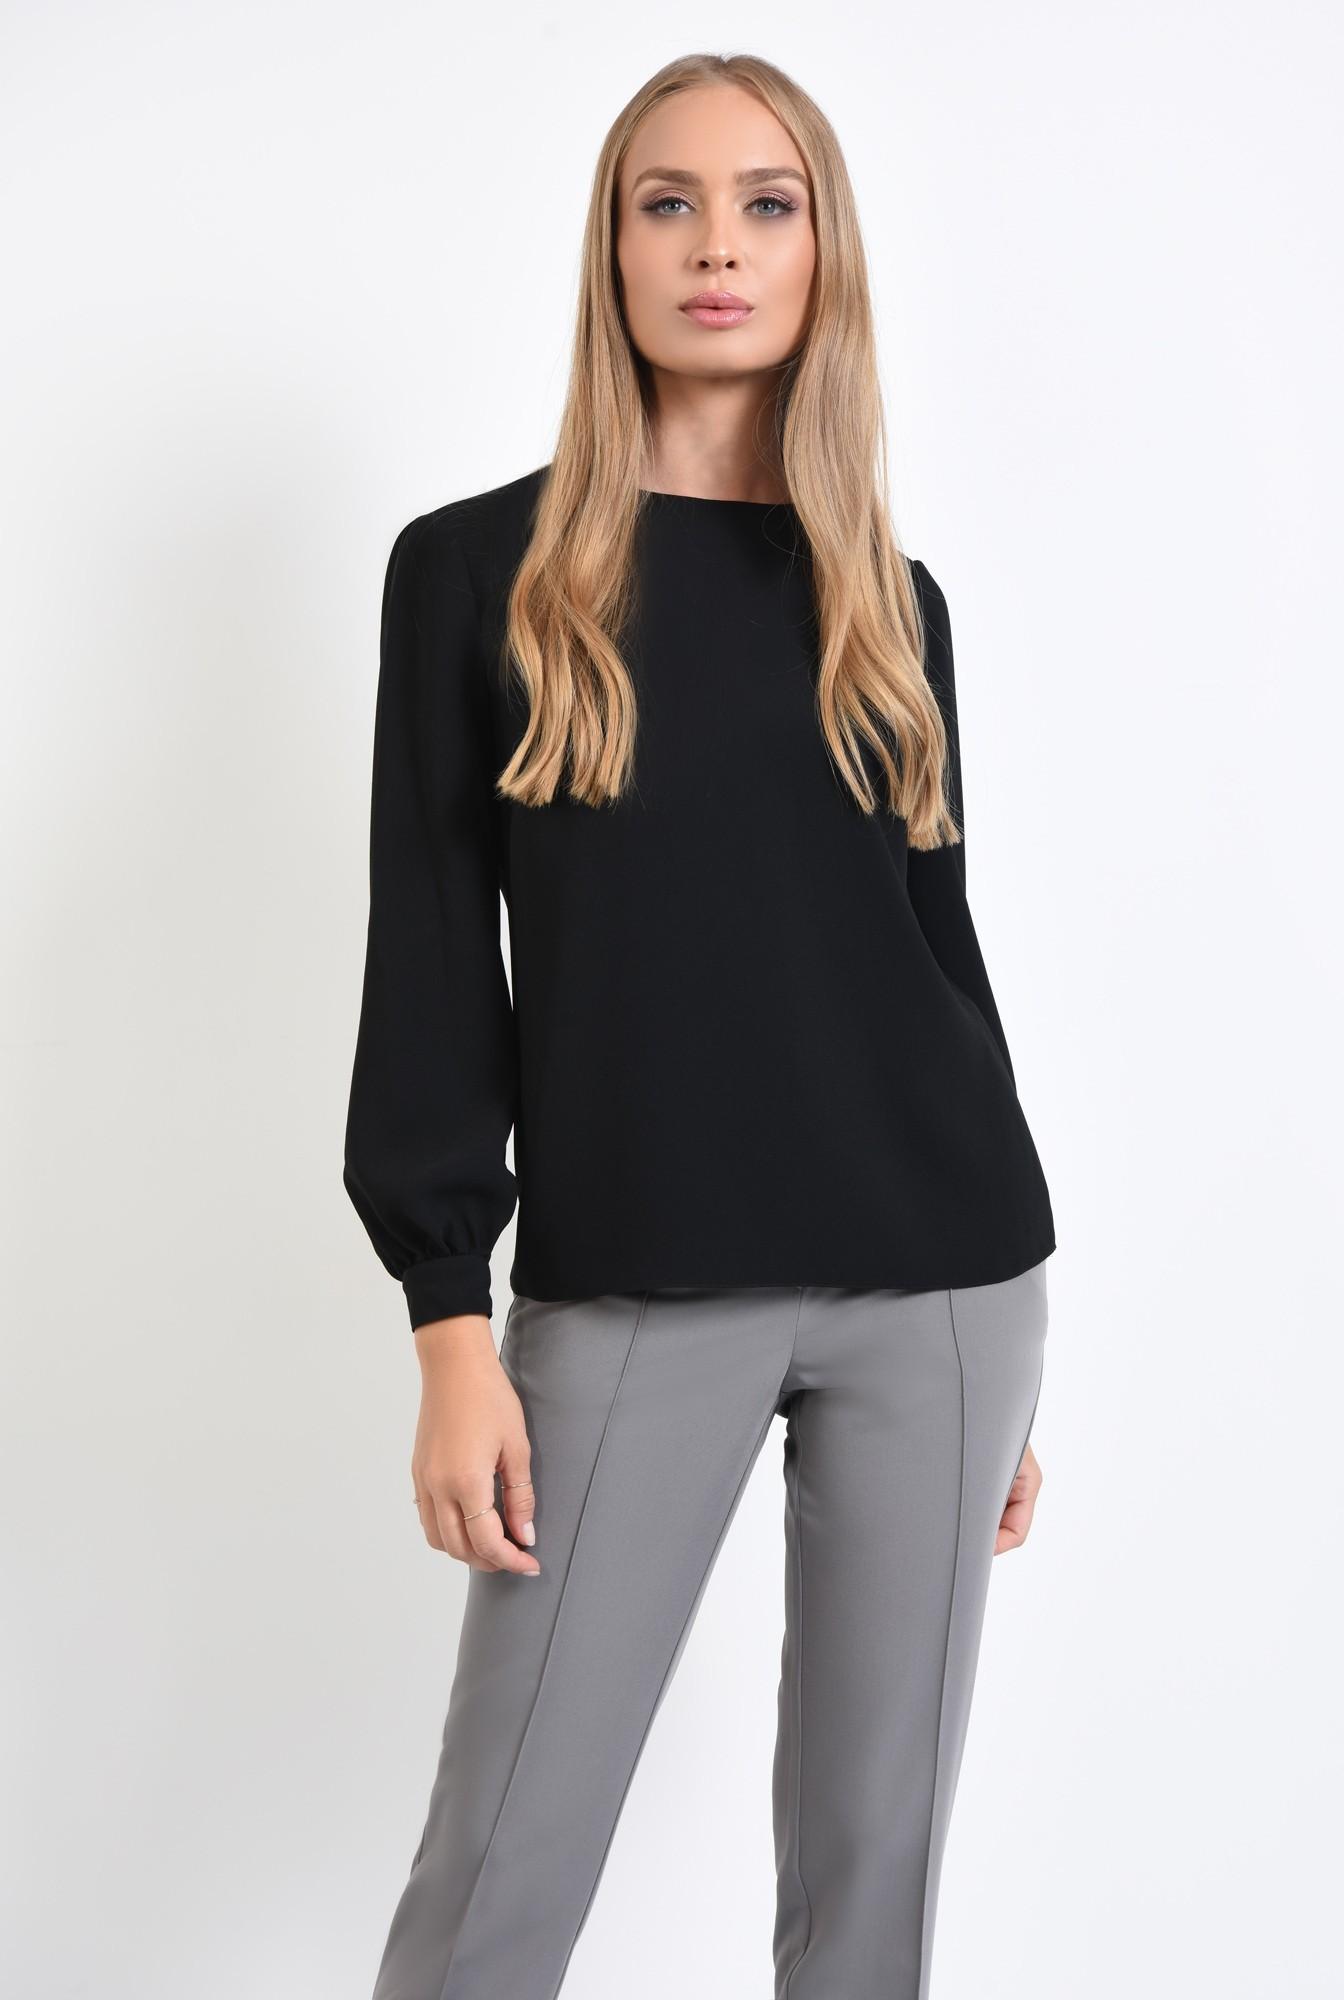 2 - 360 - bluza casual neagra, maneci cu mansete, tesatura fluida